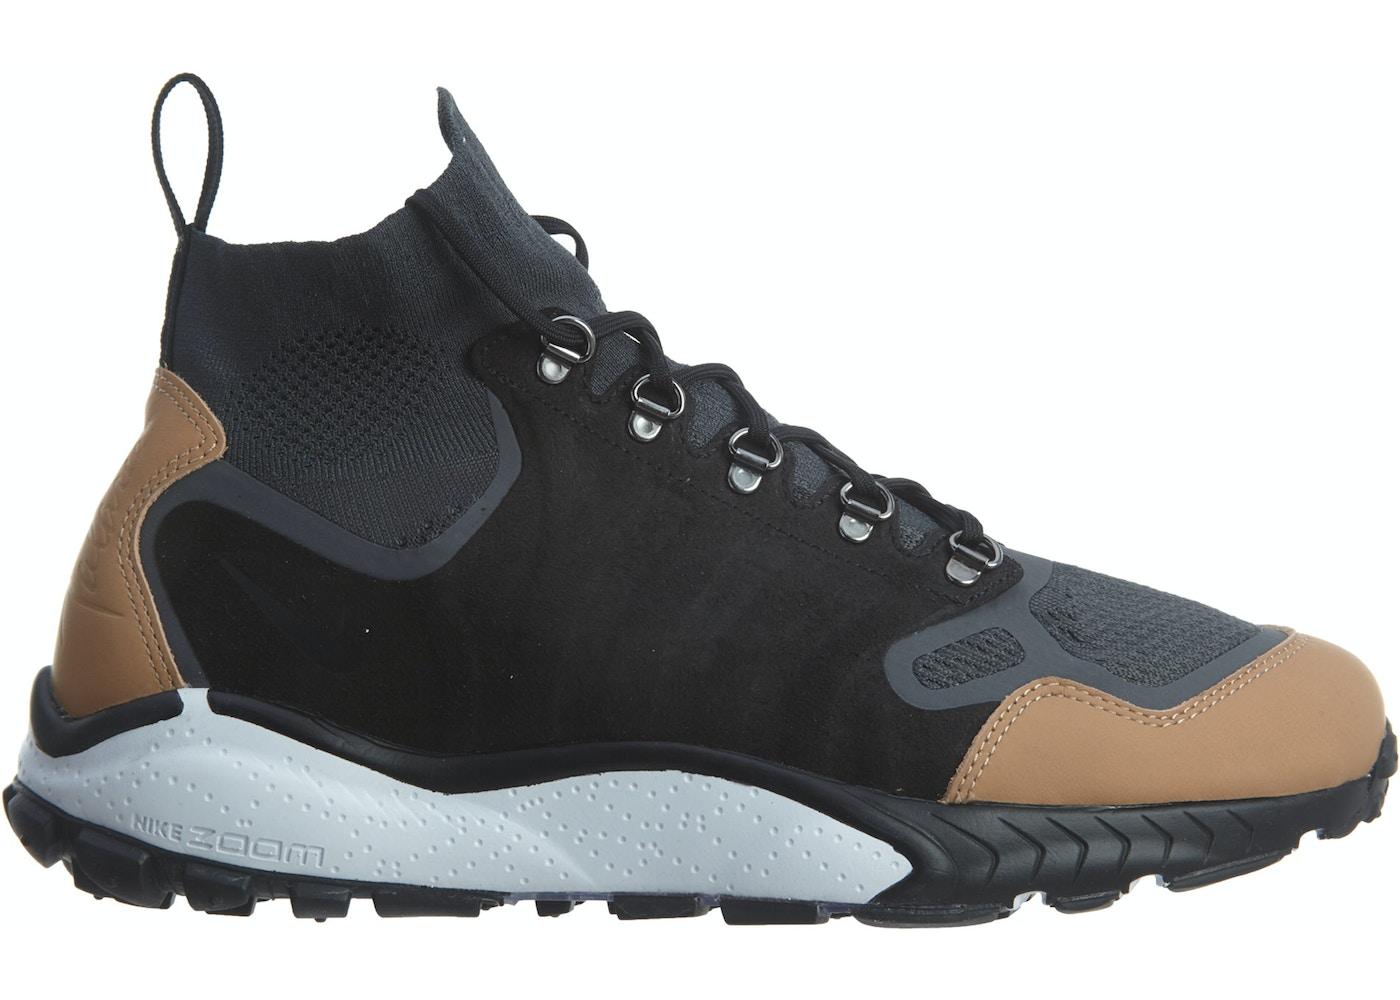 Joya juego Psicológico  Nike Air Zoom Talaria Mid Fk Prm Anthracite Black-Vachetta Tan - 875784-001